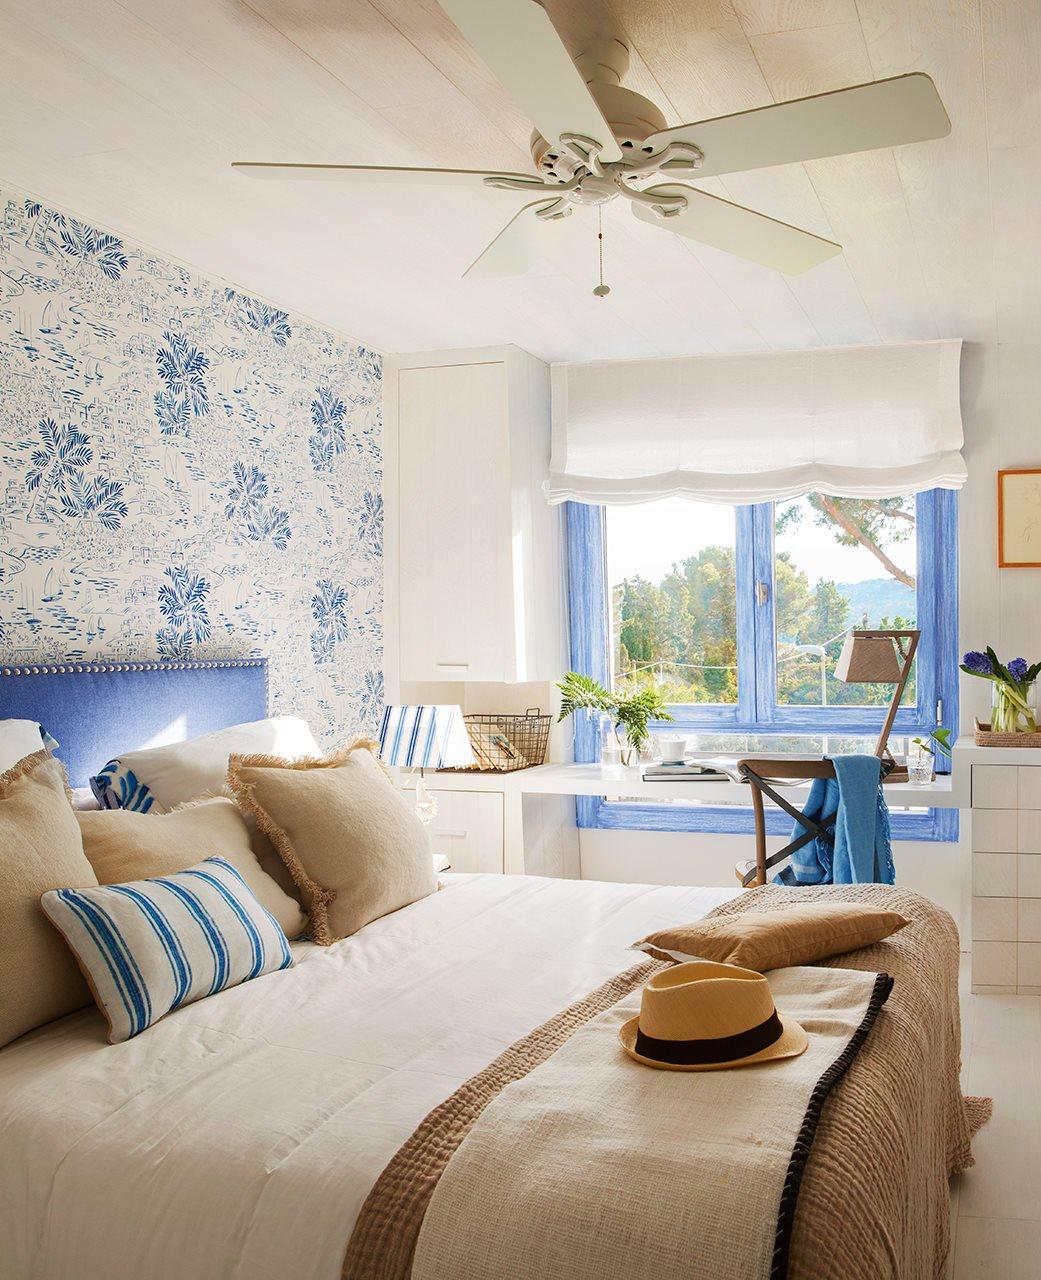 Decordemon When The Summer Is Blue ~ Papel Pintado Dormitorio Blanco